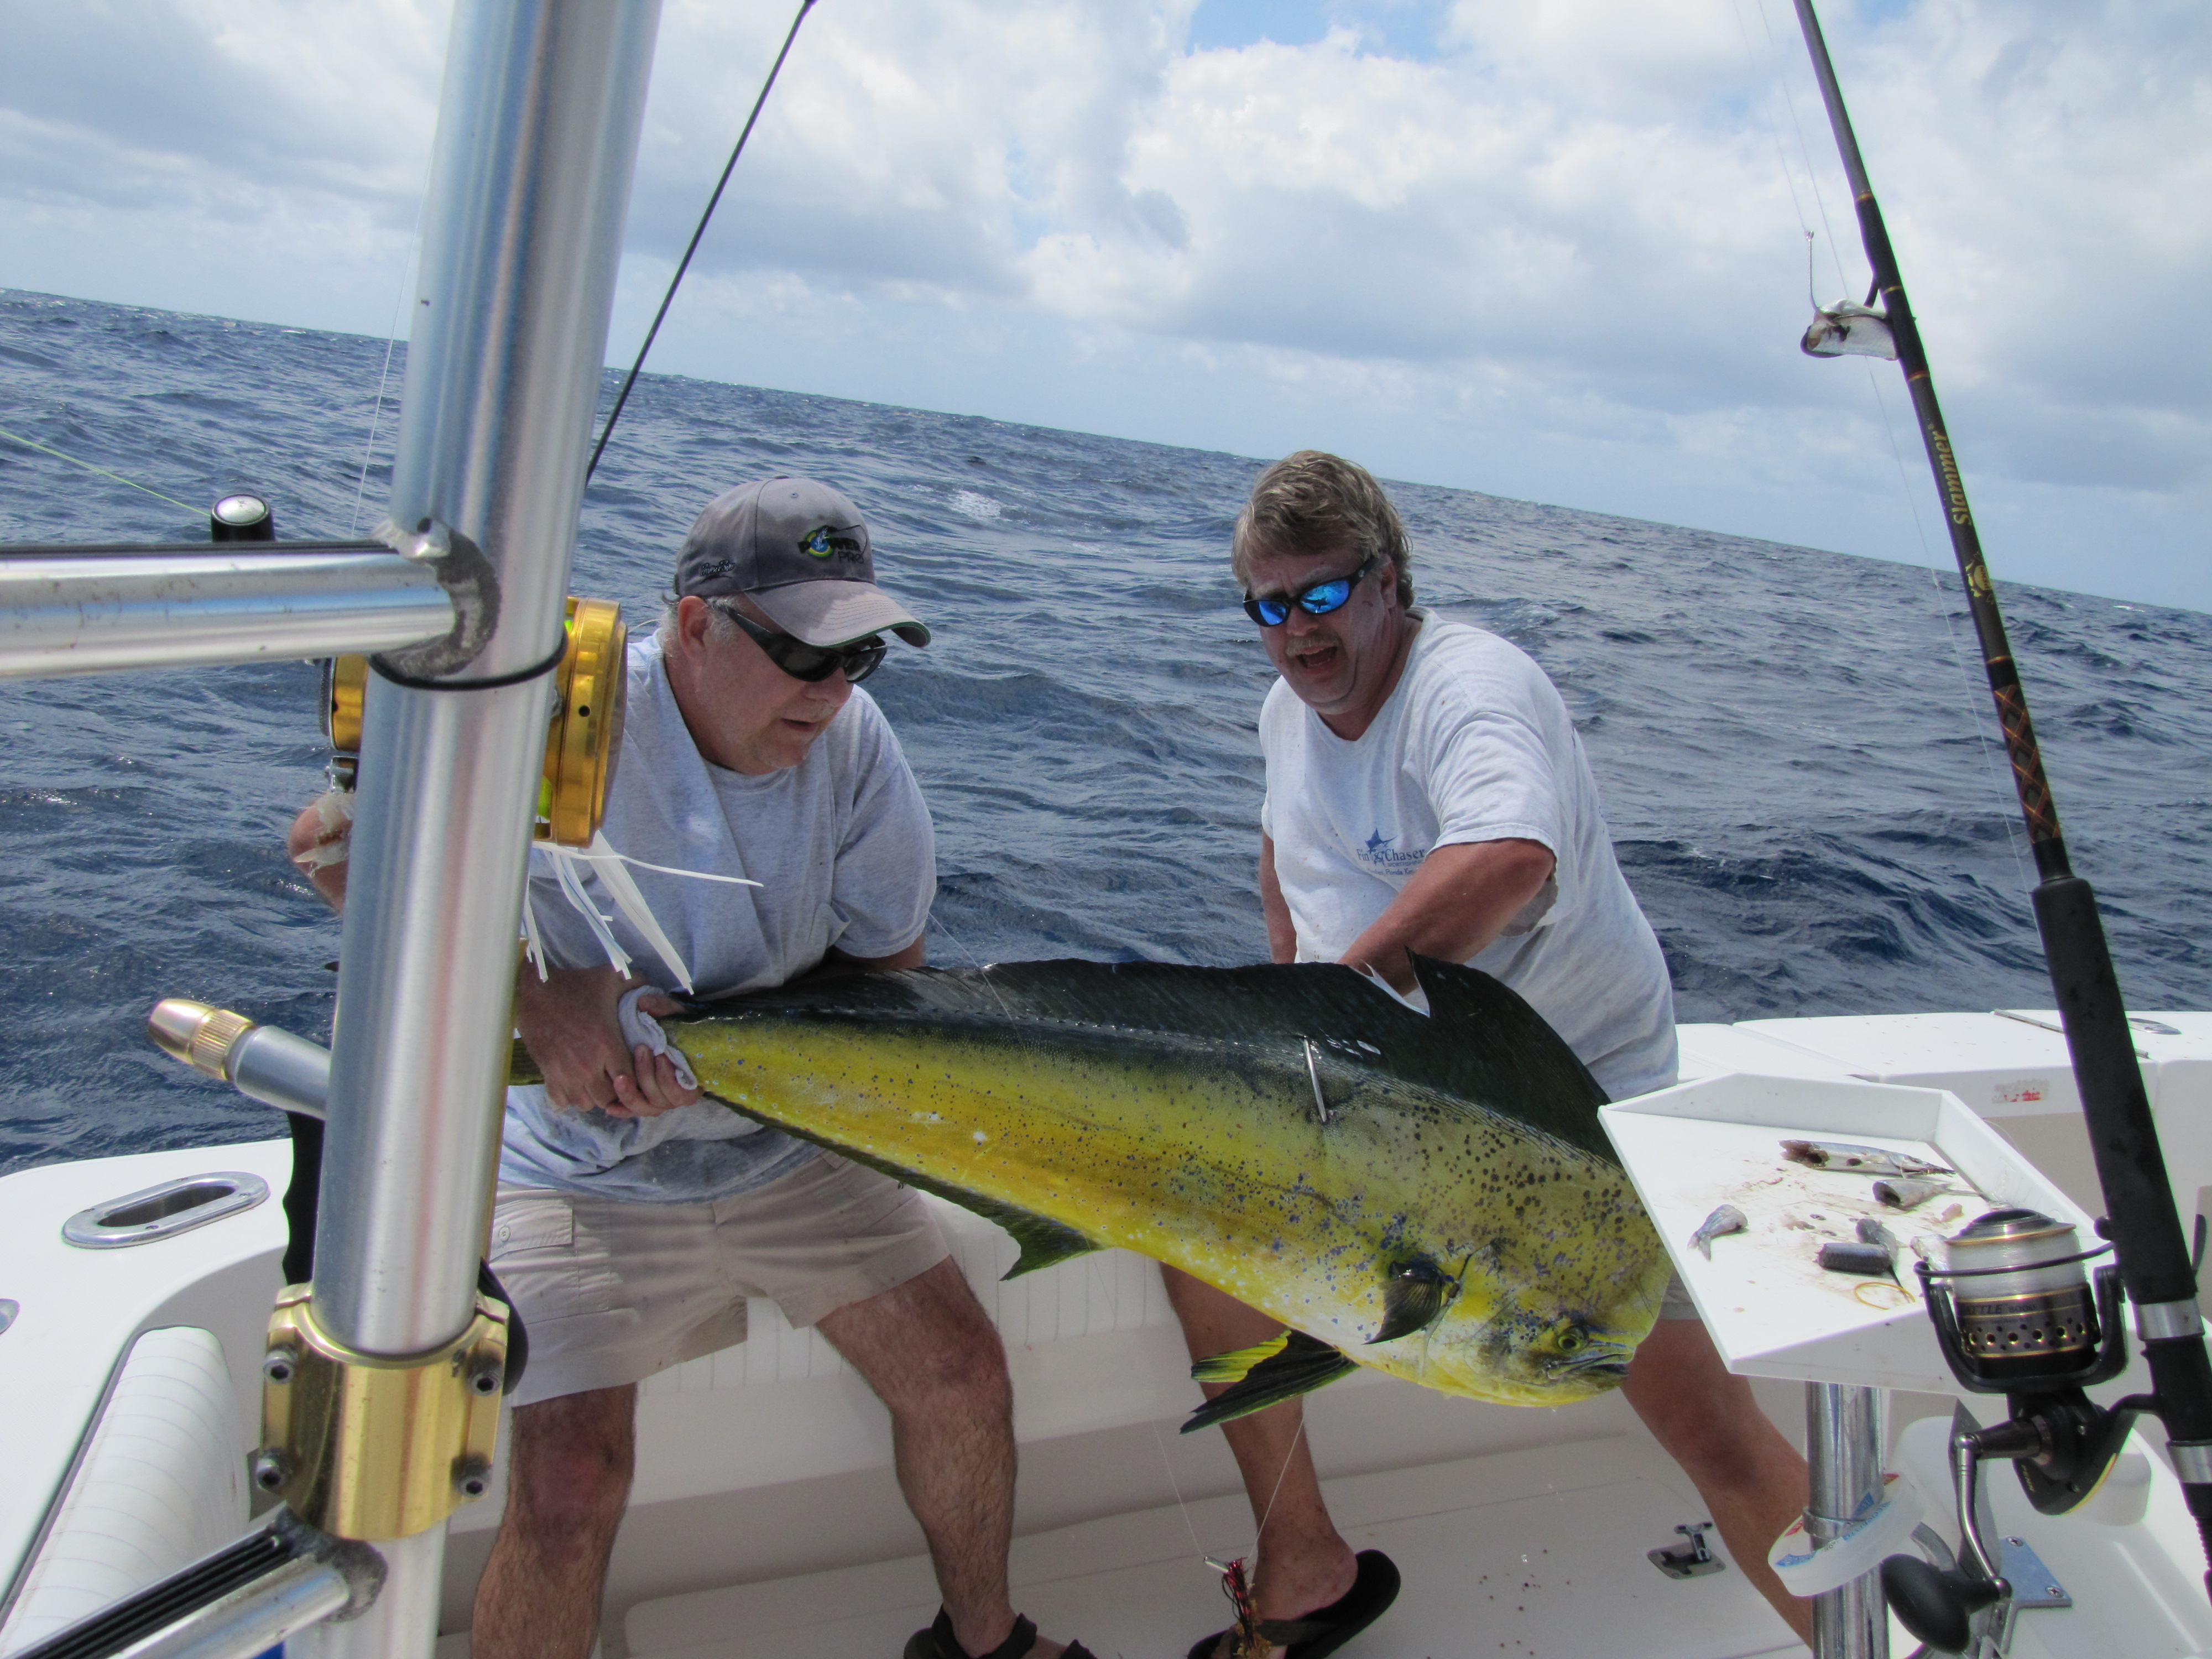 Finnz up charters in marathon fl 33050 for Fishing marathon fl